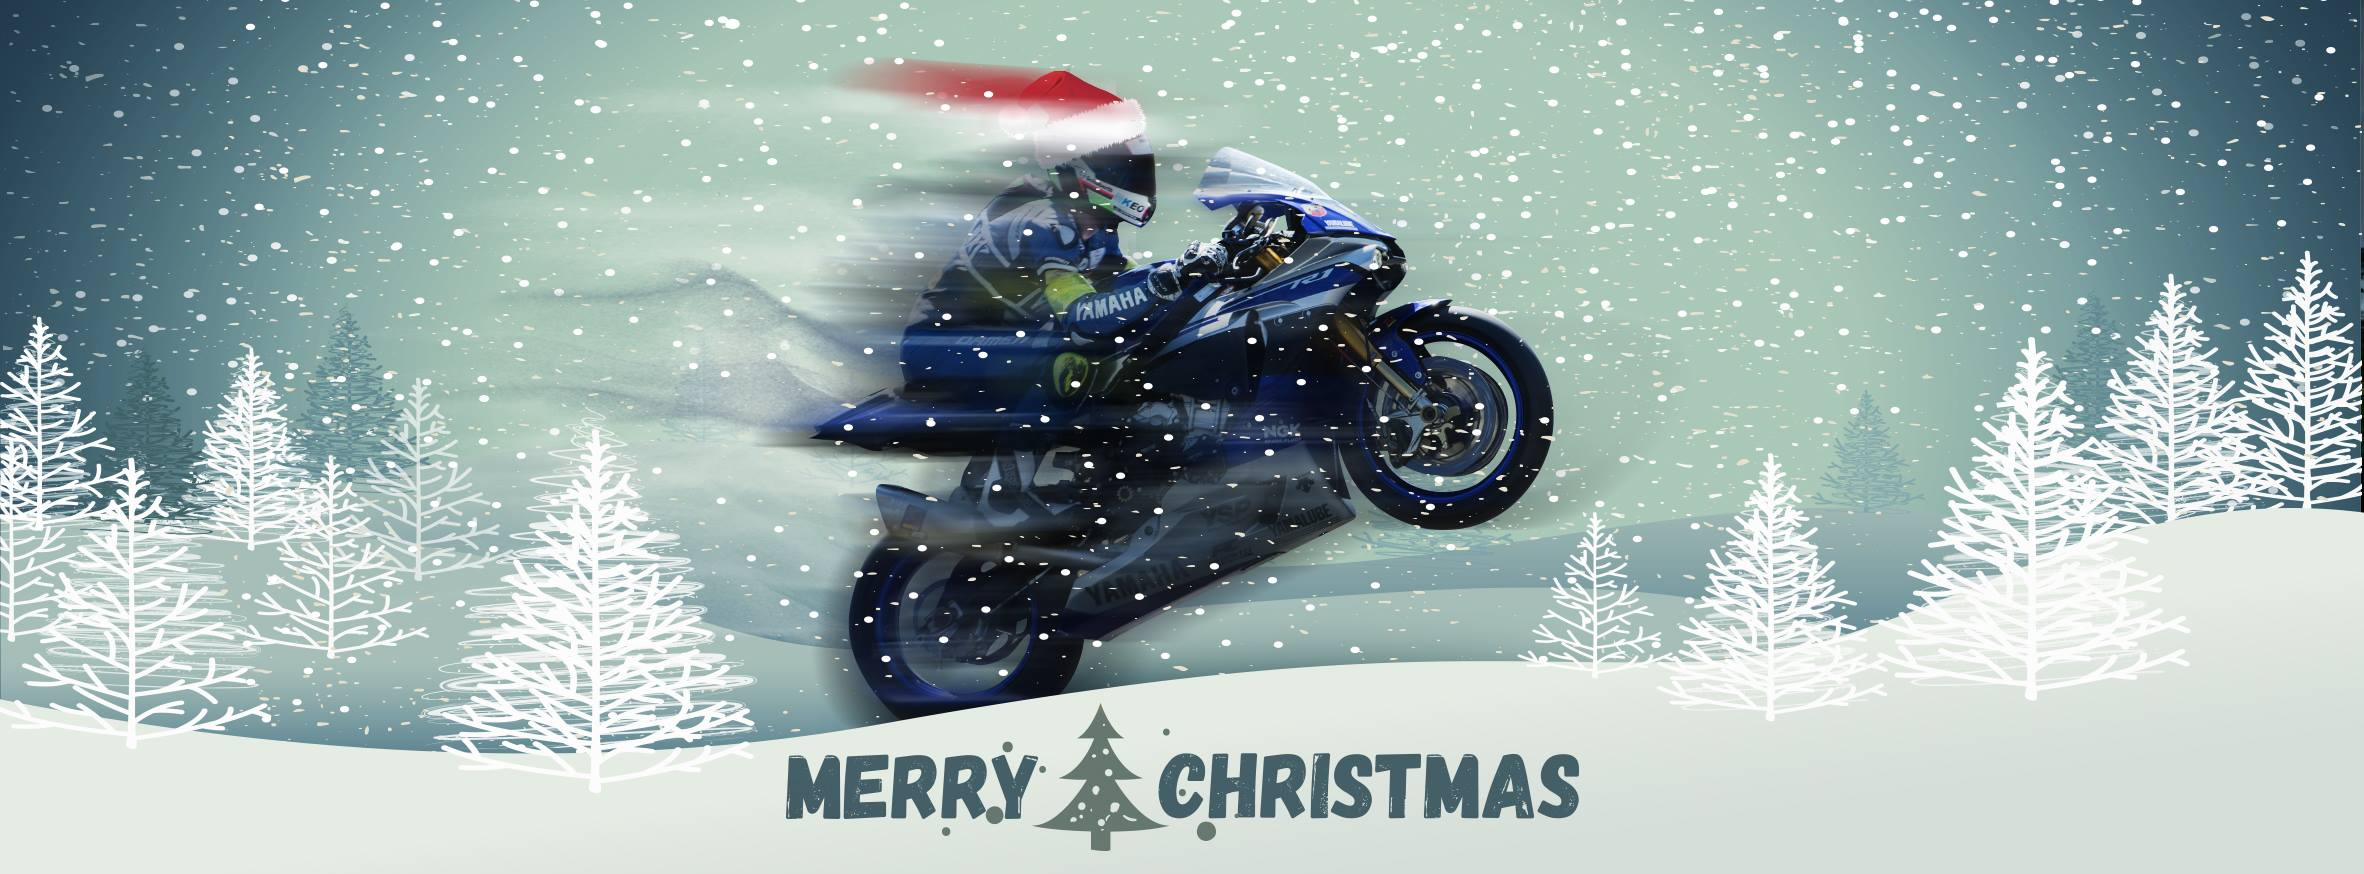 Joyeux Noël et bonnes fêtes  96105615578004101544870430048211531217687033402944o